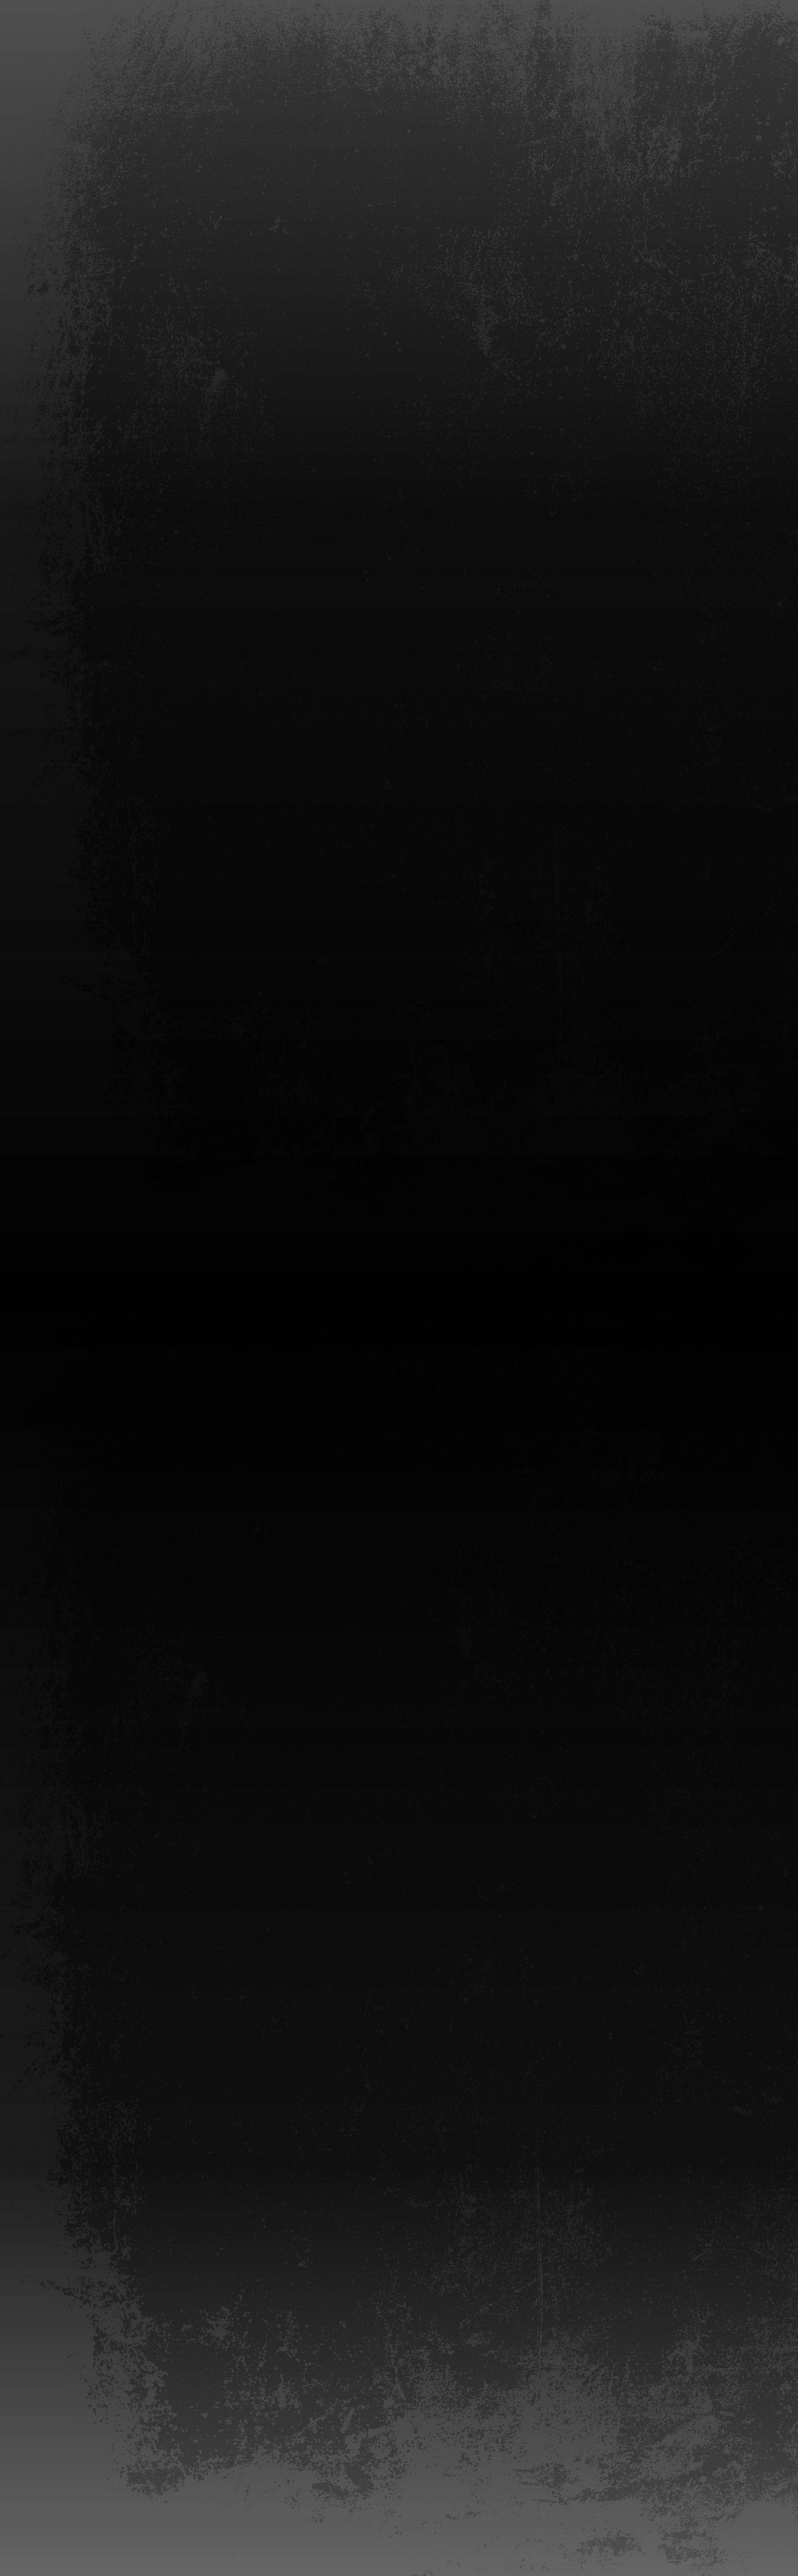 Lapstar_Website Asset_D_BLACK BACKGROUND